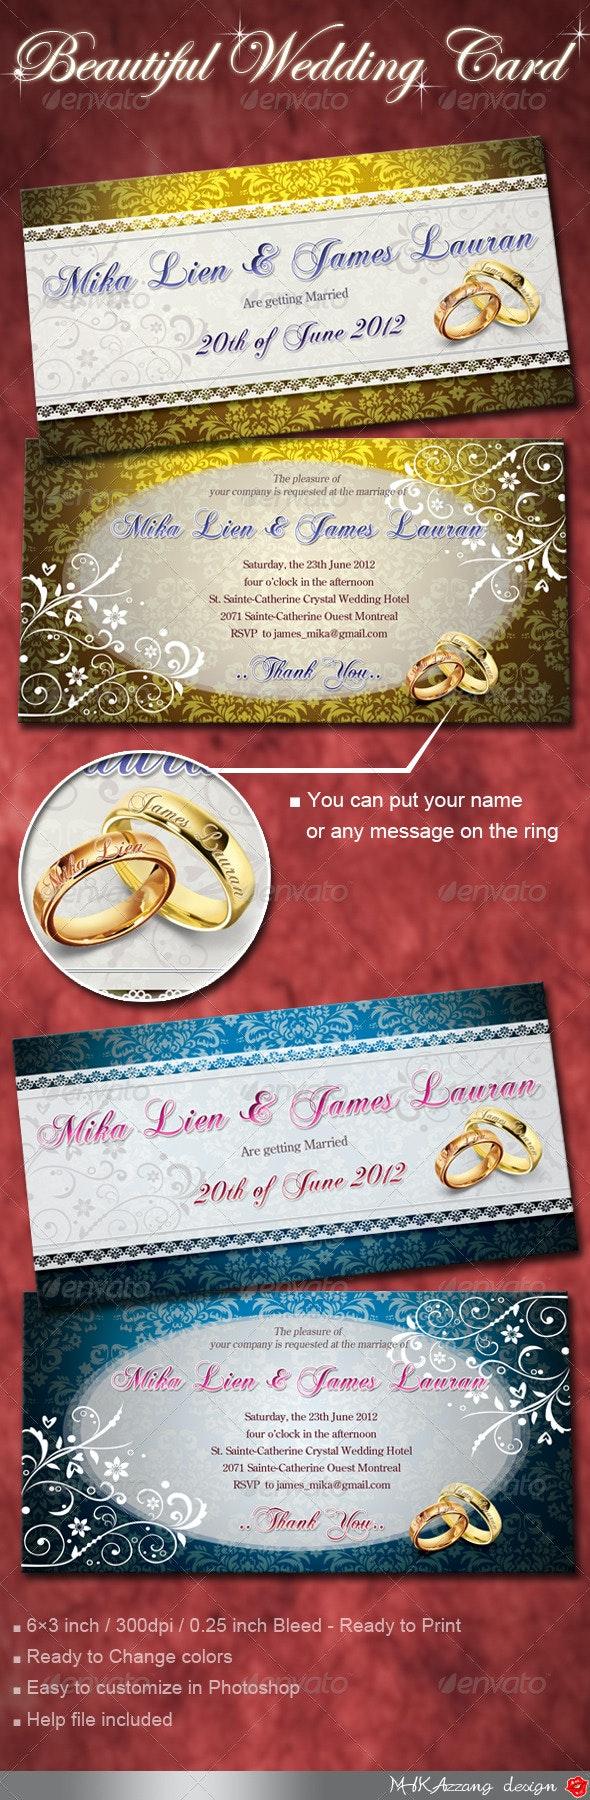 Elegant Wedding Invitation Cards - Weddings Cards & Invites